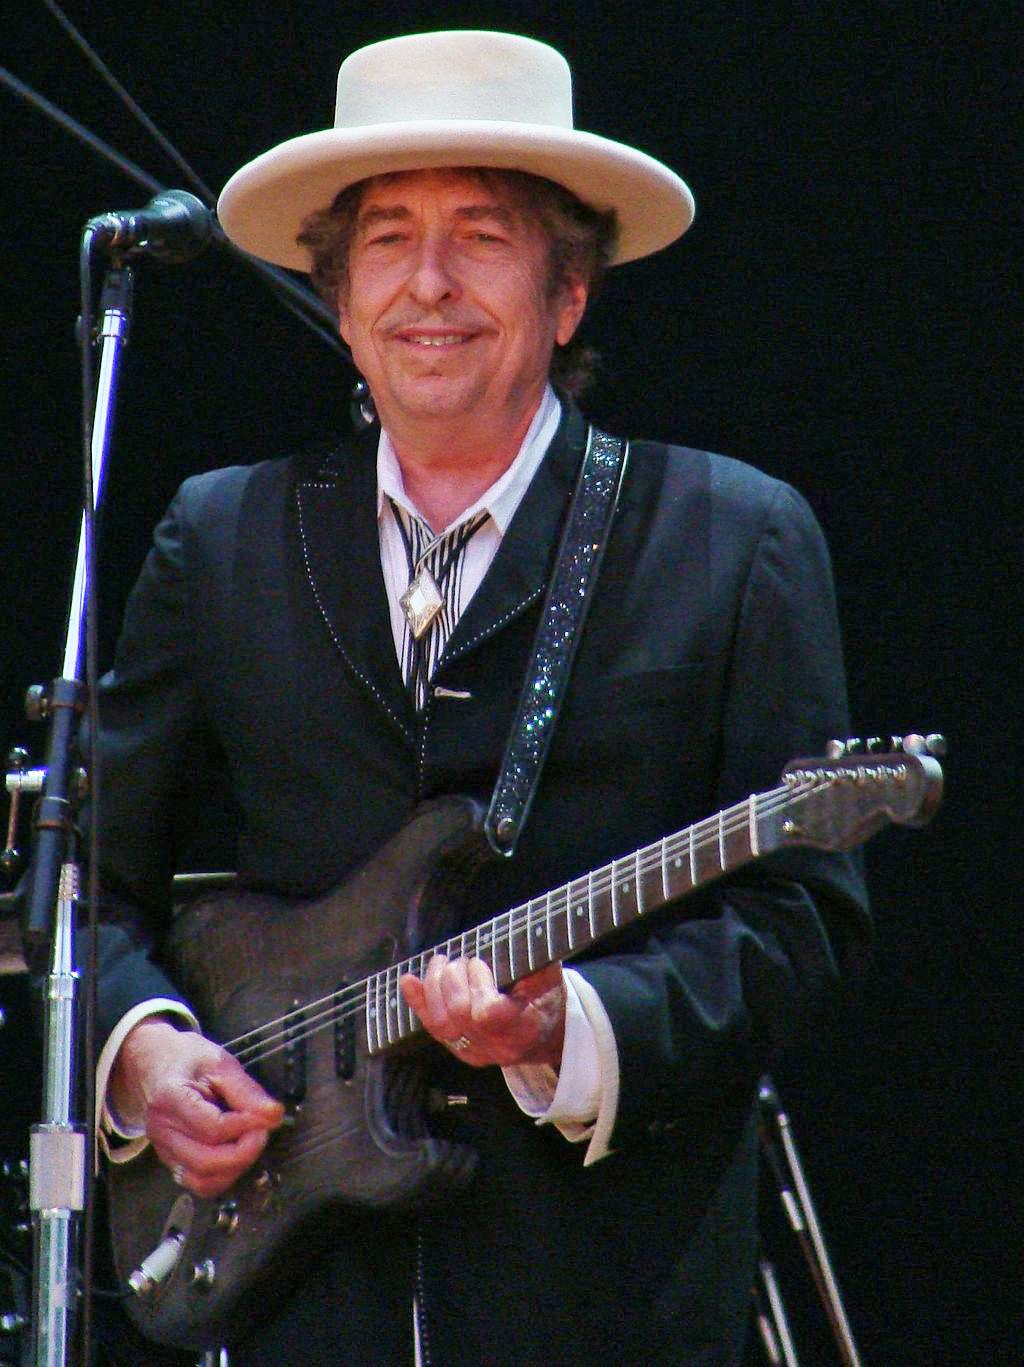 Bob Dylan, lauréat du Prix Nobel de Littérature 2016